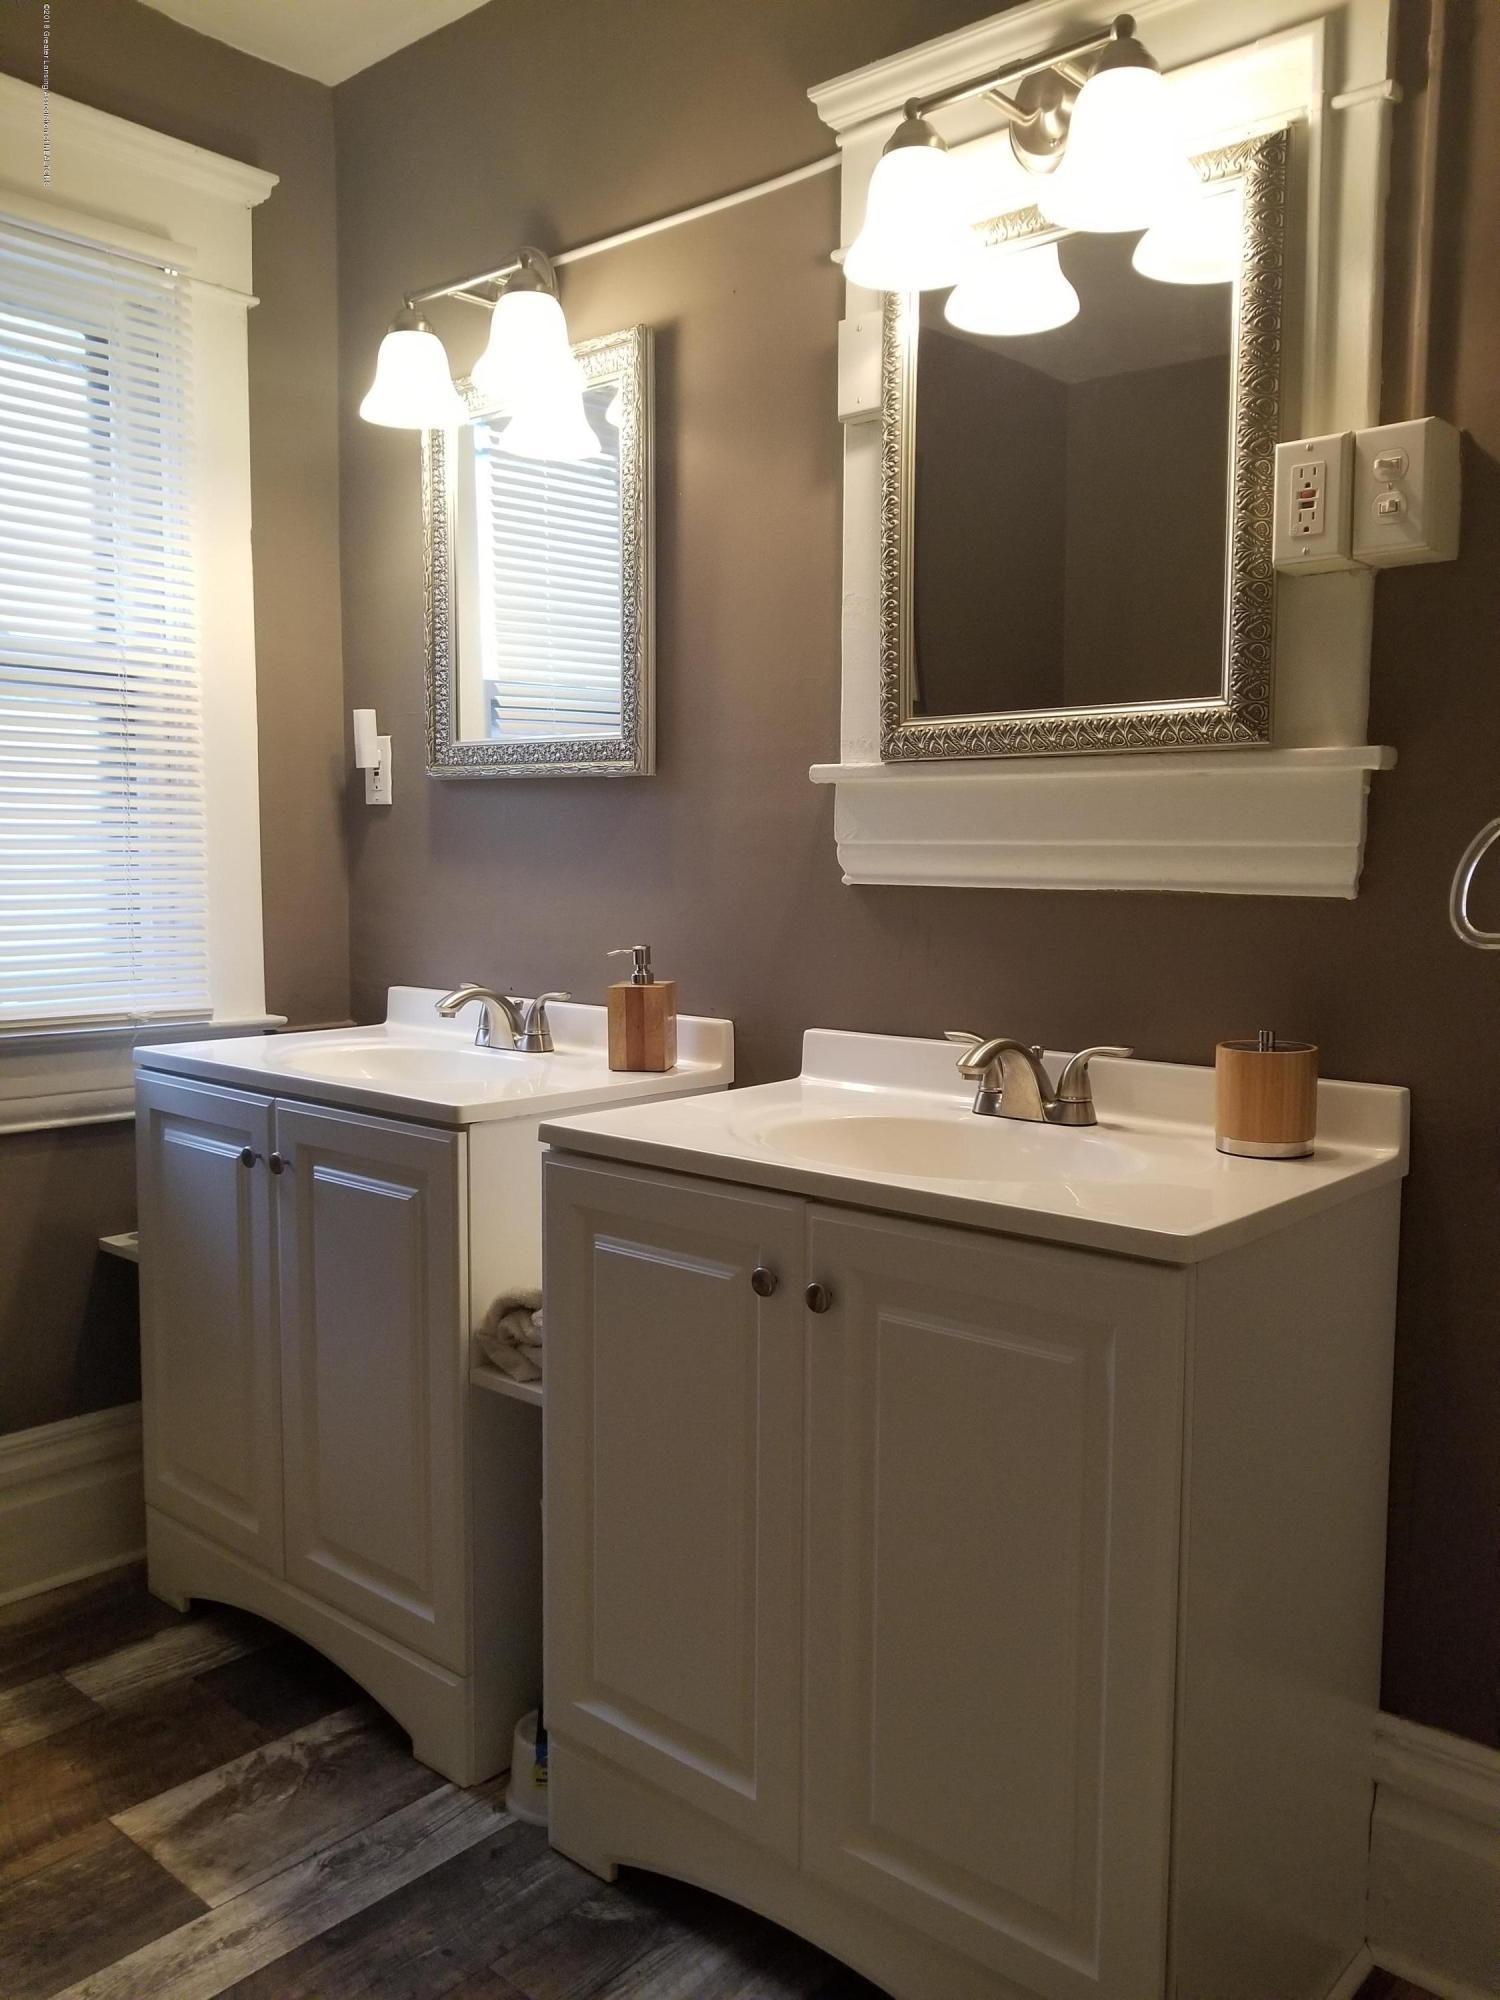 309 W Lapeer St - Bathroom - 12